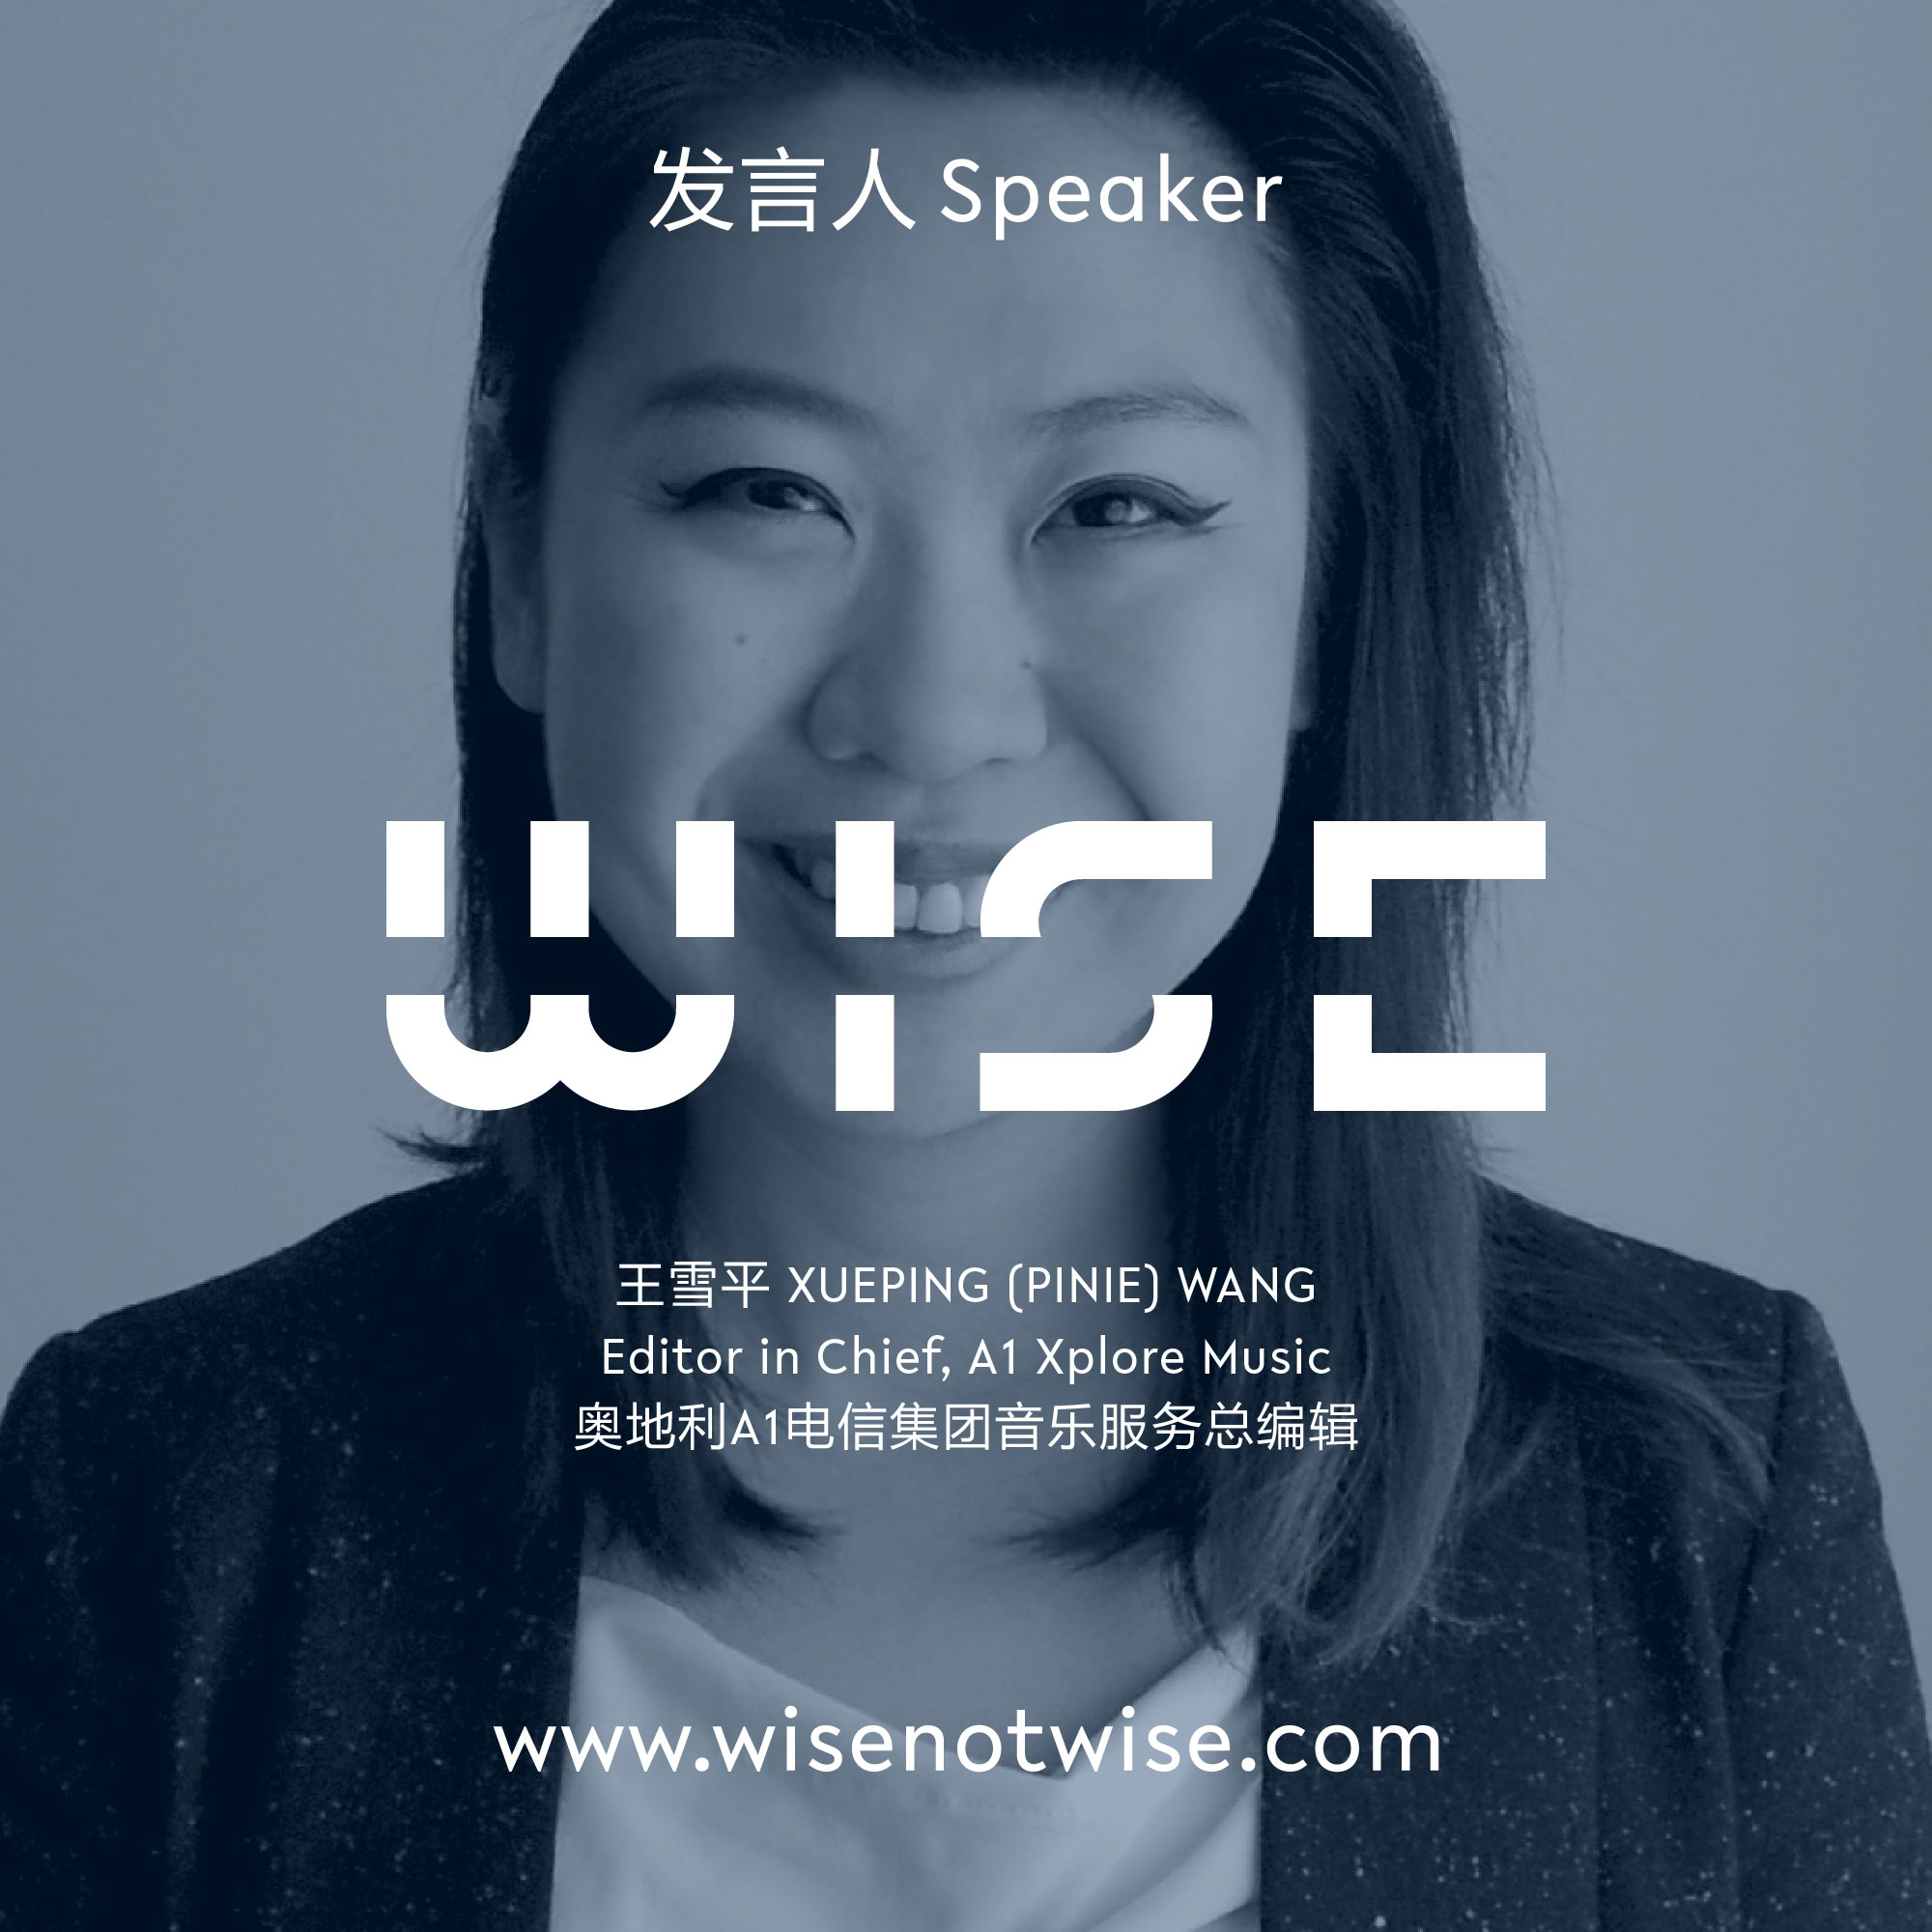 Xueping (Pinie) Wang, Editor in Chief, A1 Xplore Music